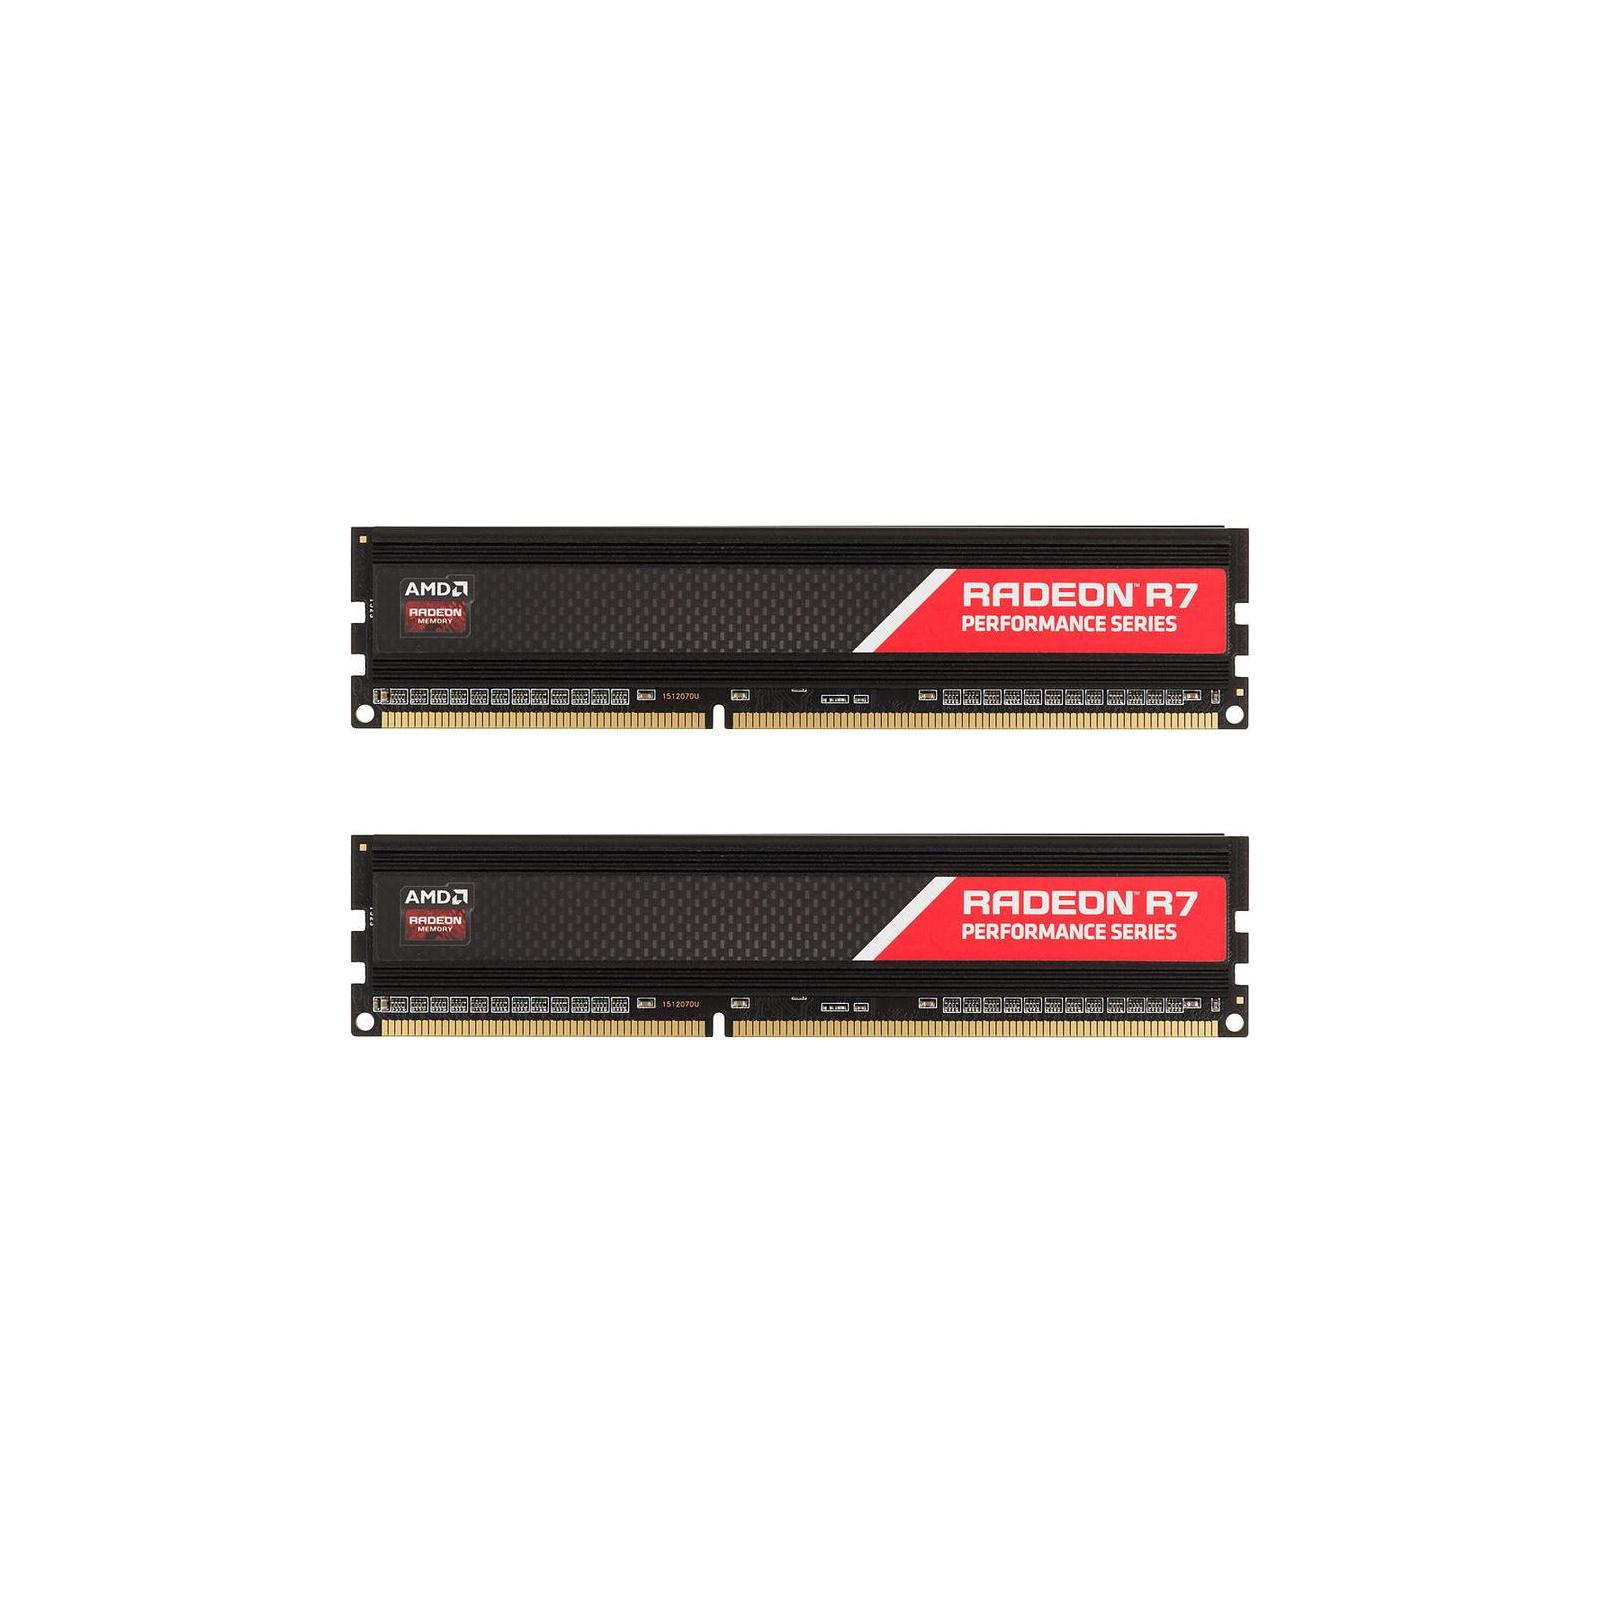 Модуль памяти для компьютера DDR4 8GB (2x4GB) 2400 MHz Radeon R7 AMD (R748G2400U1K)